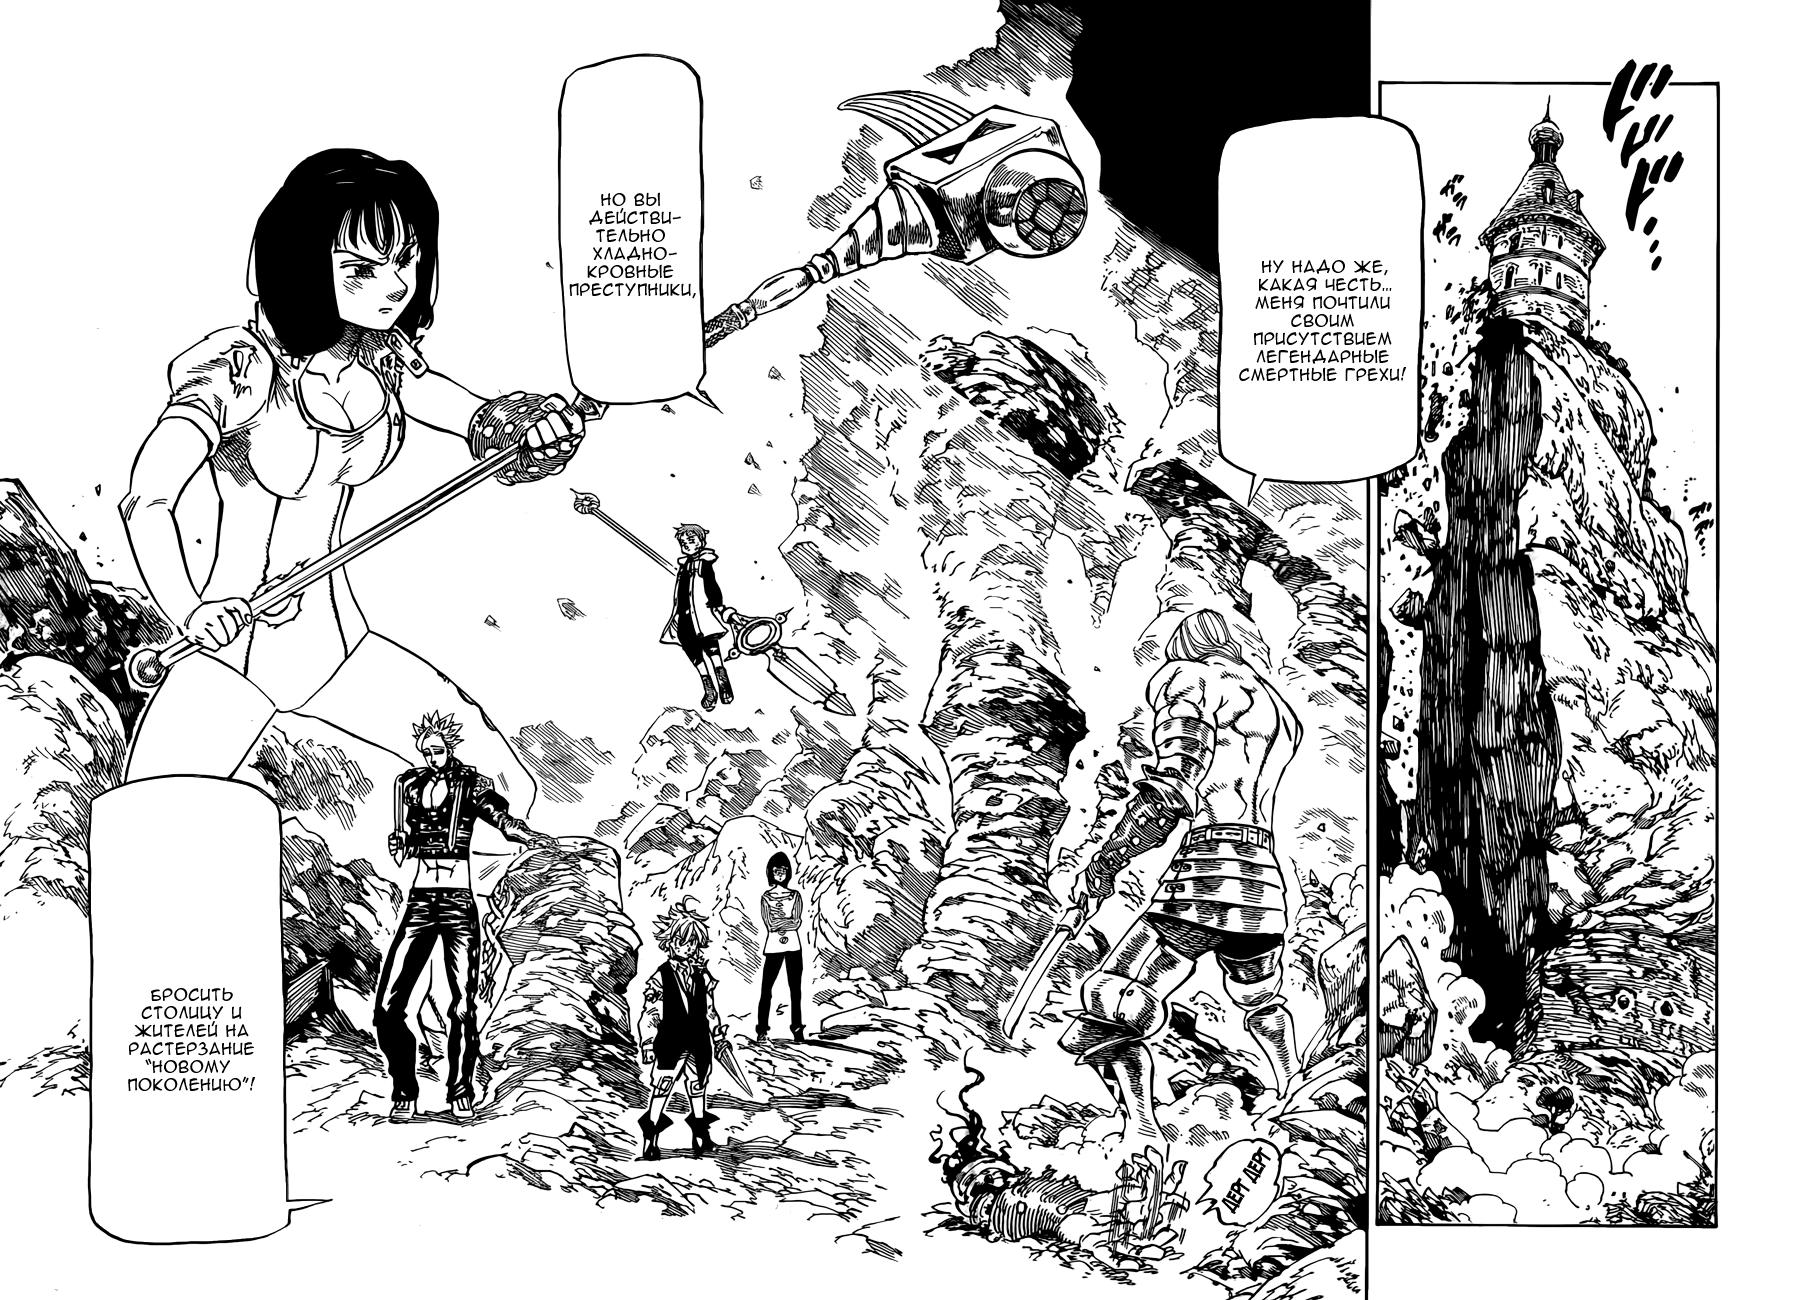 https://r1.ninemanga.com/comics/pic2/29/22109/229312/1428990133710.jpg Page 3